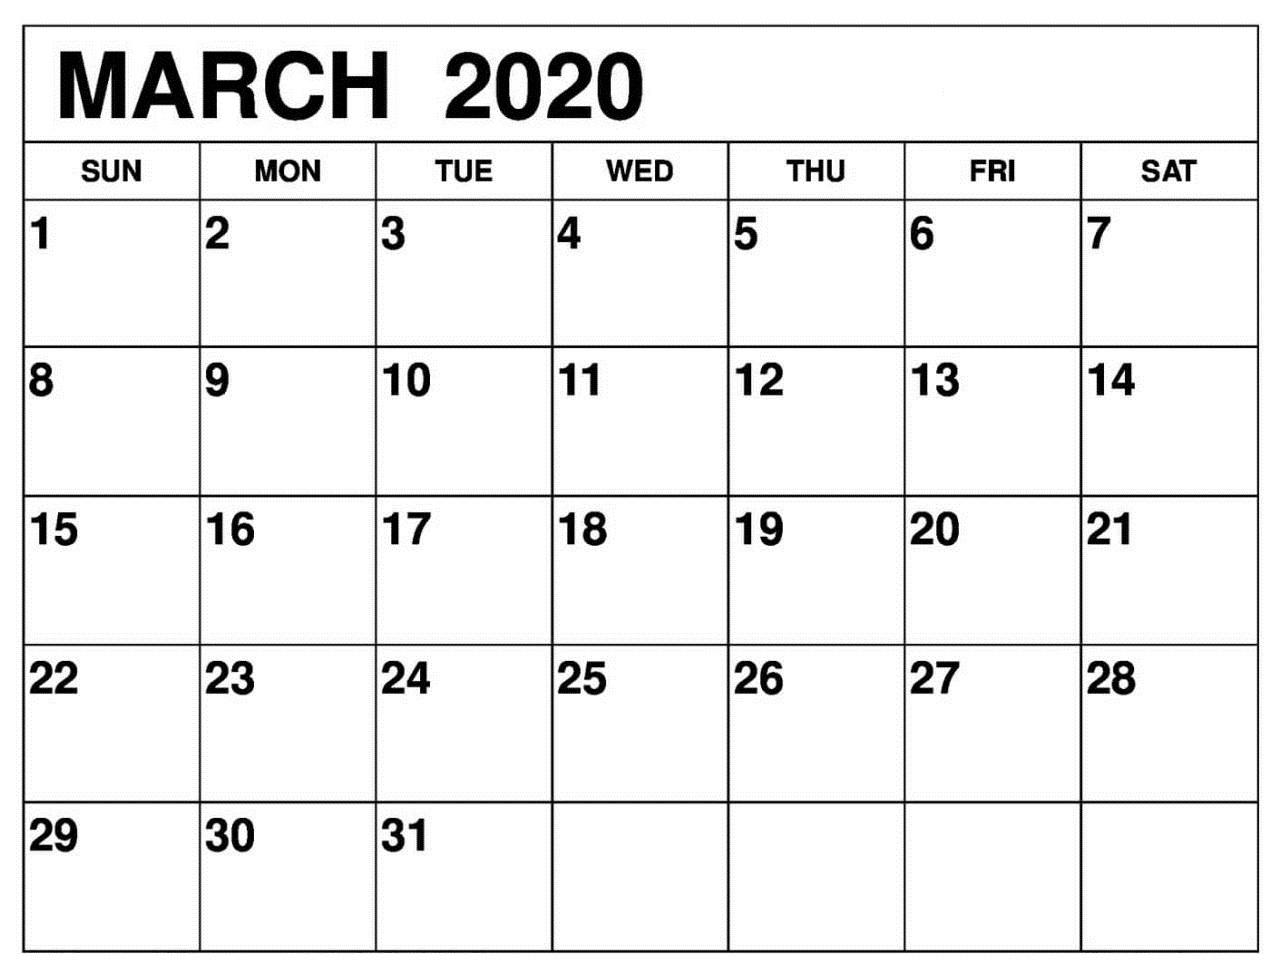 Planner March 2020 Calendar US